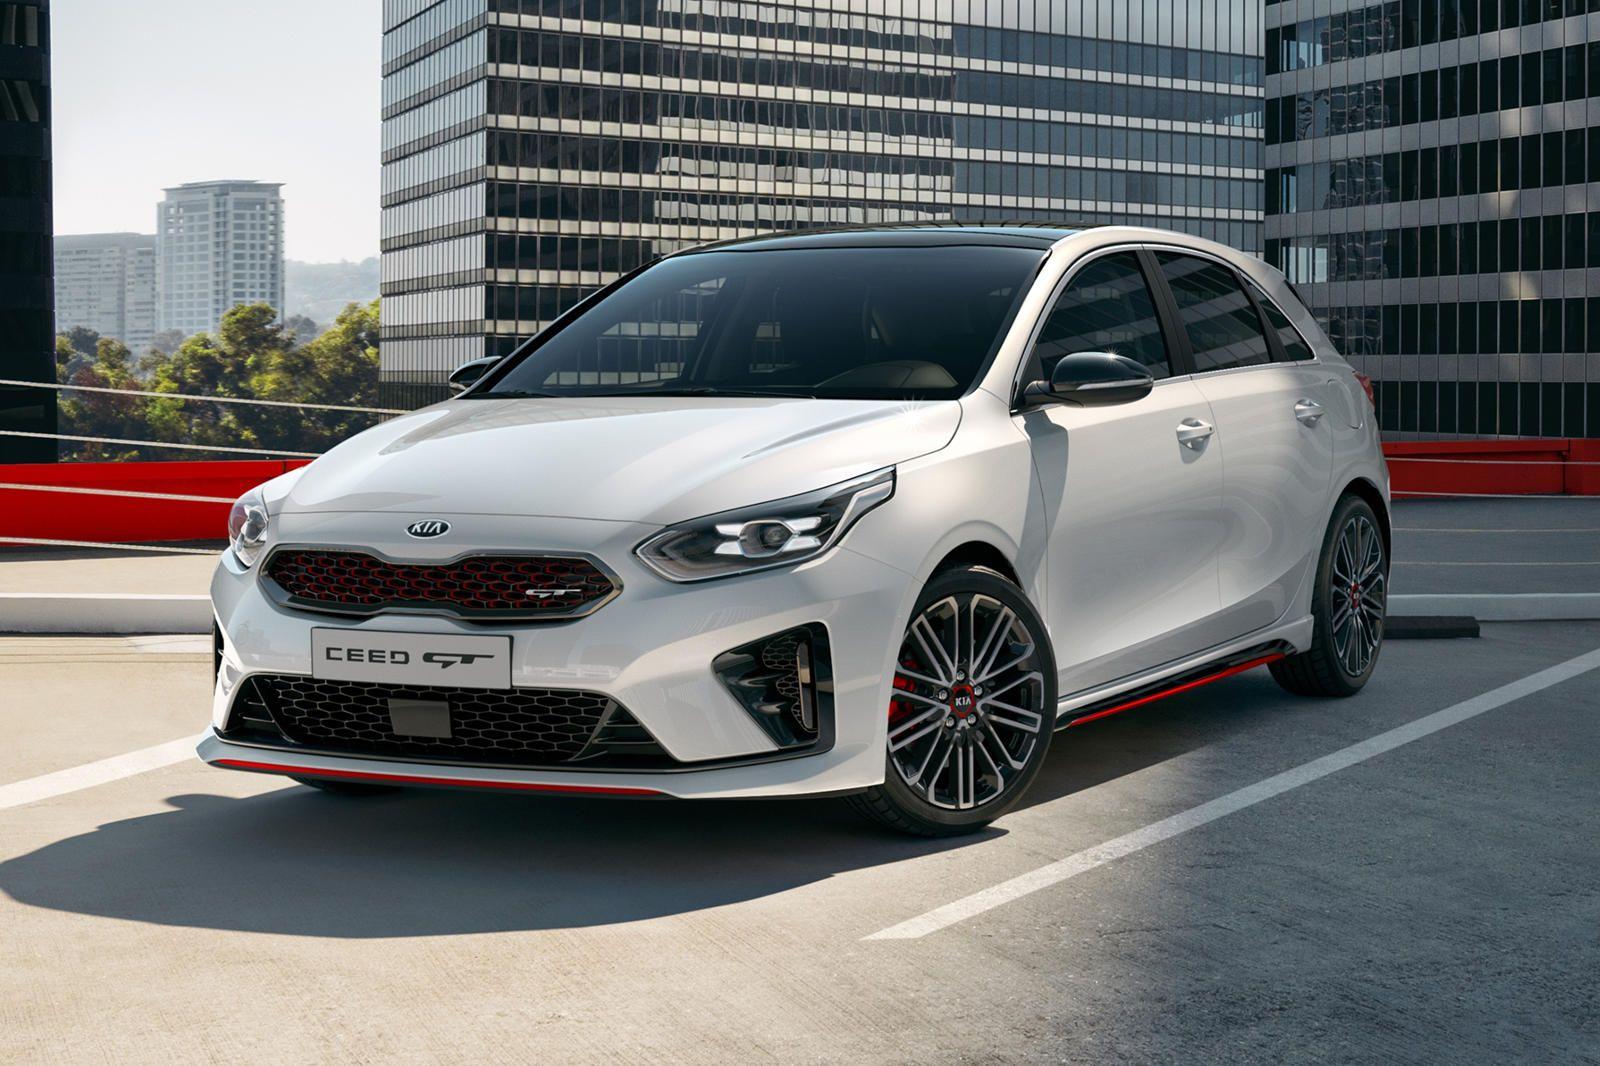 2019 Kia Ceed Gt Could Preview The New Forte5 Hot Hatch Kia Autos Motores Sensor De Lluvia